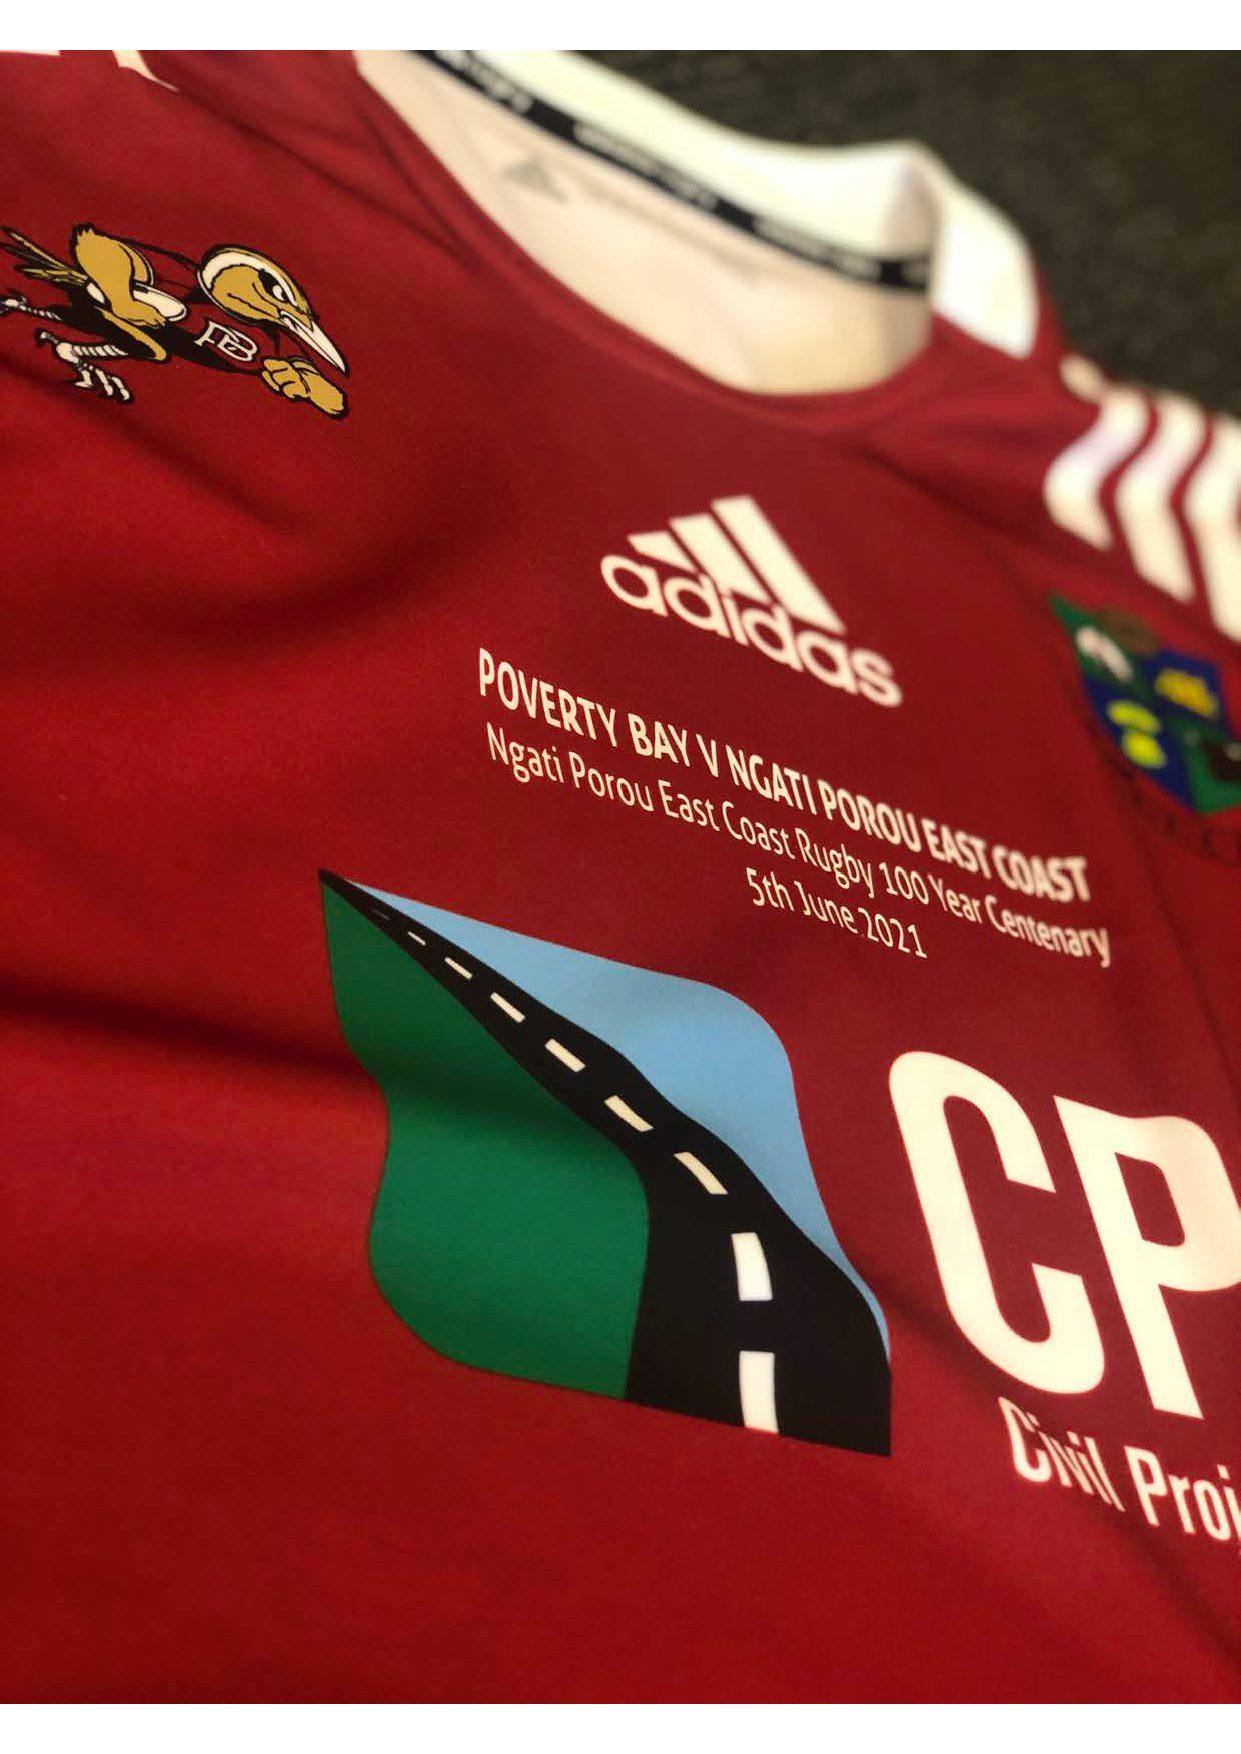 Commemorative jersey for NPEC Centenary game